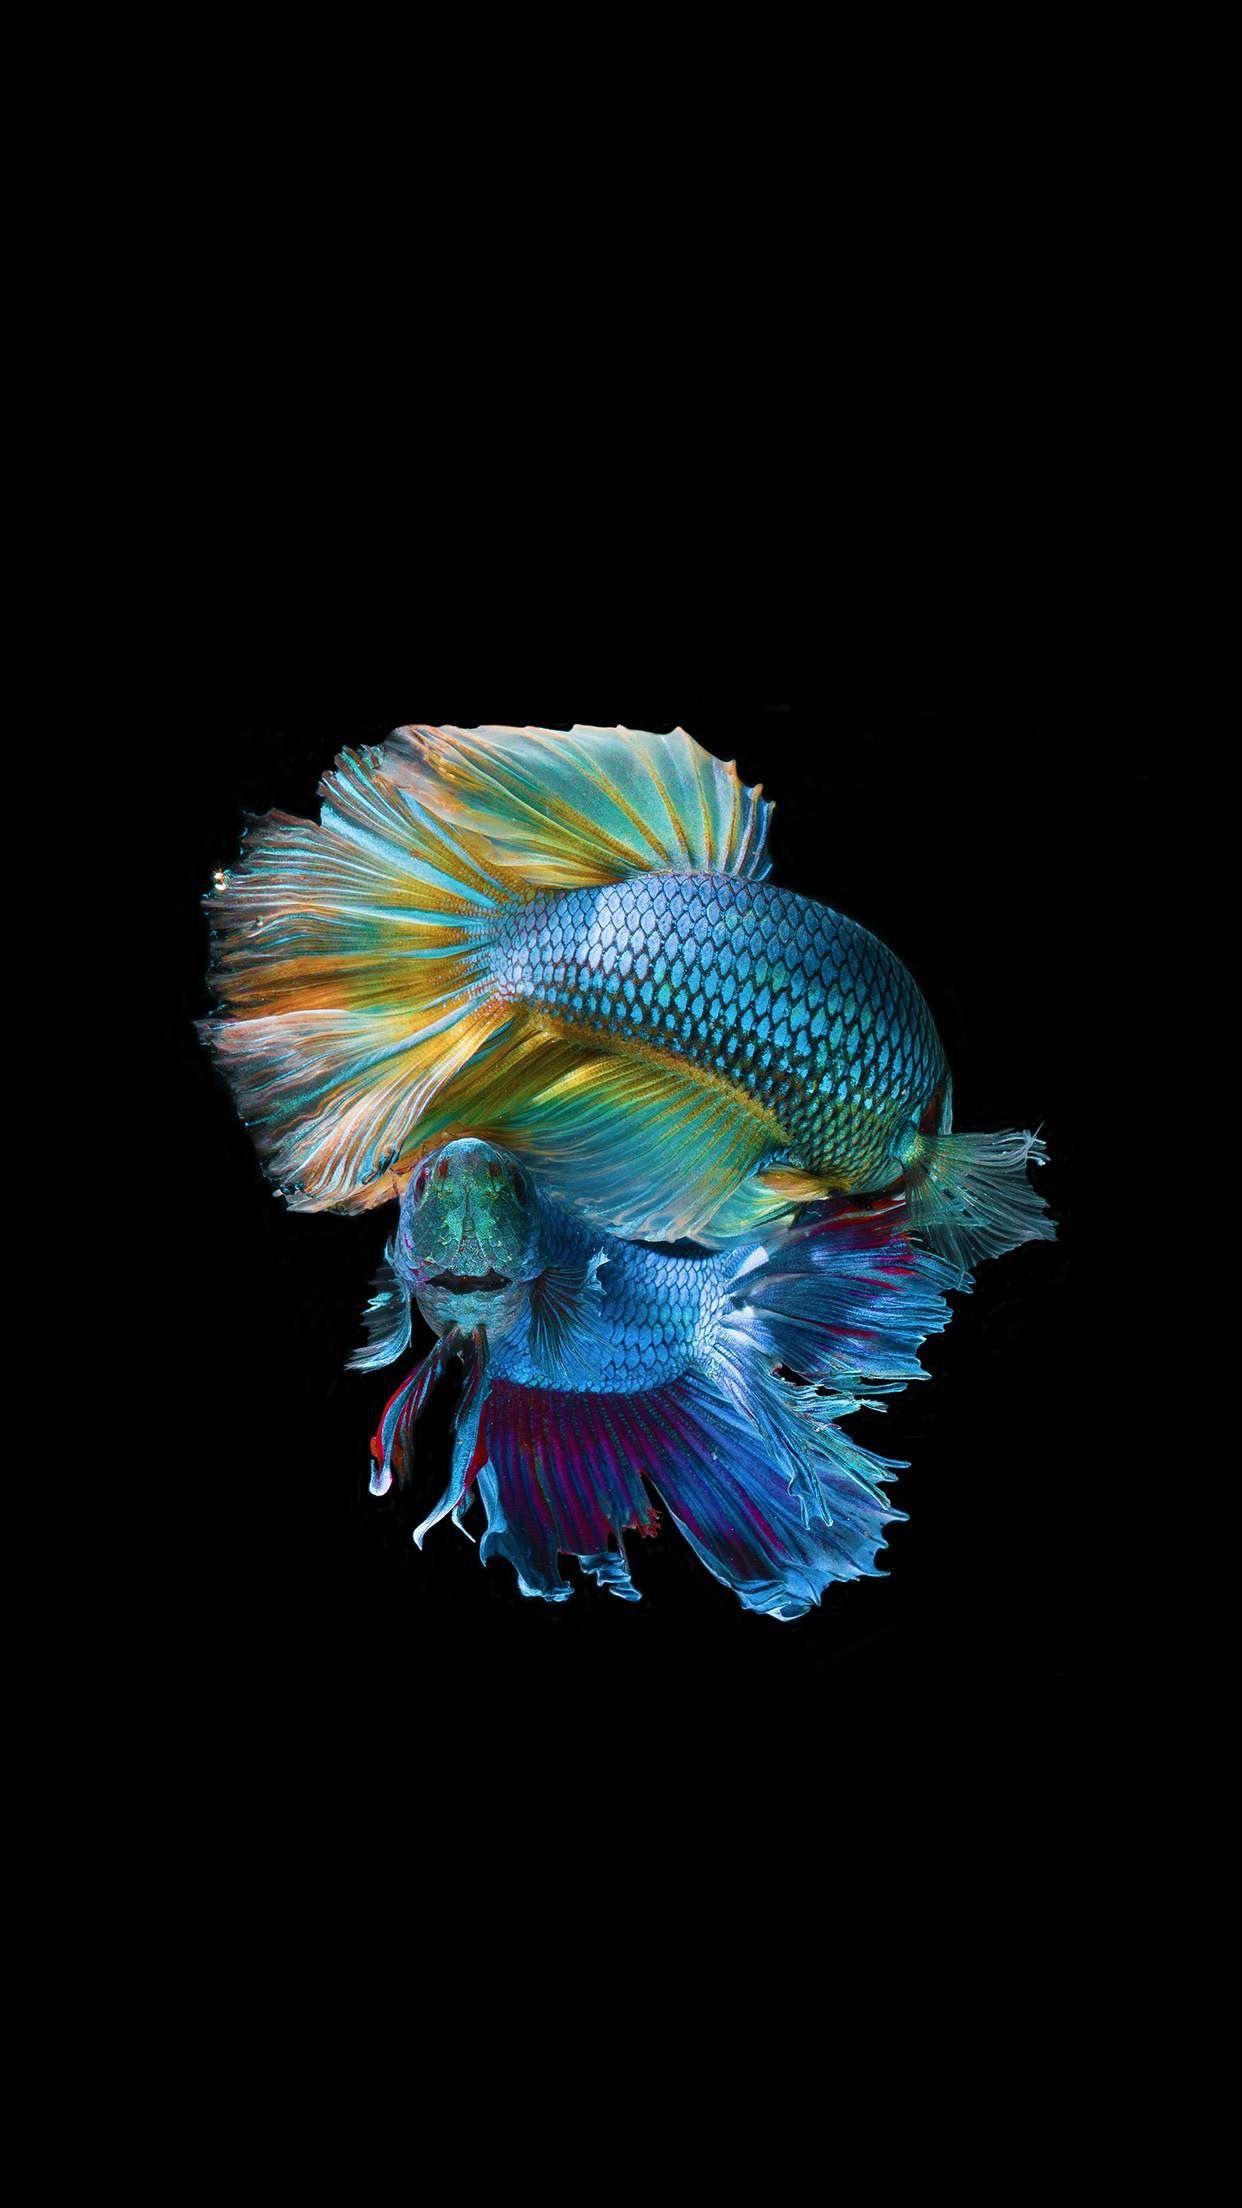 Ultra Vibrant Colour Fish Wallpaper Iphone Betta Fish Fish Wallpaper